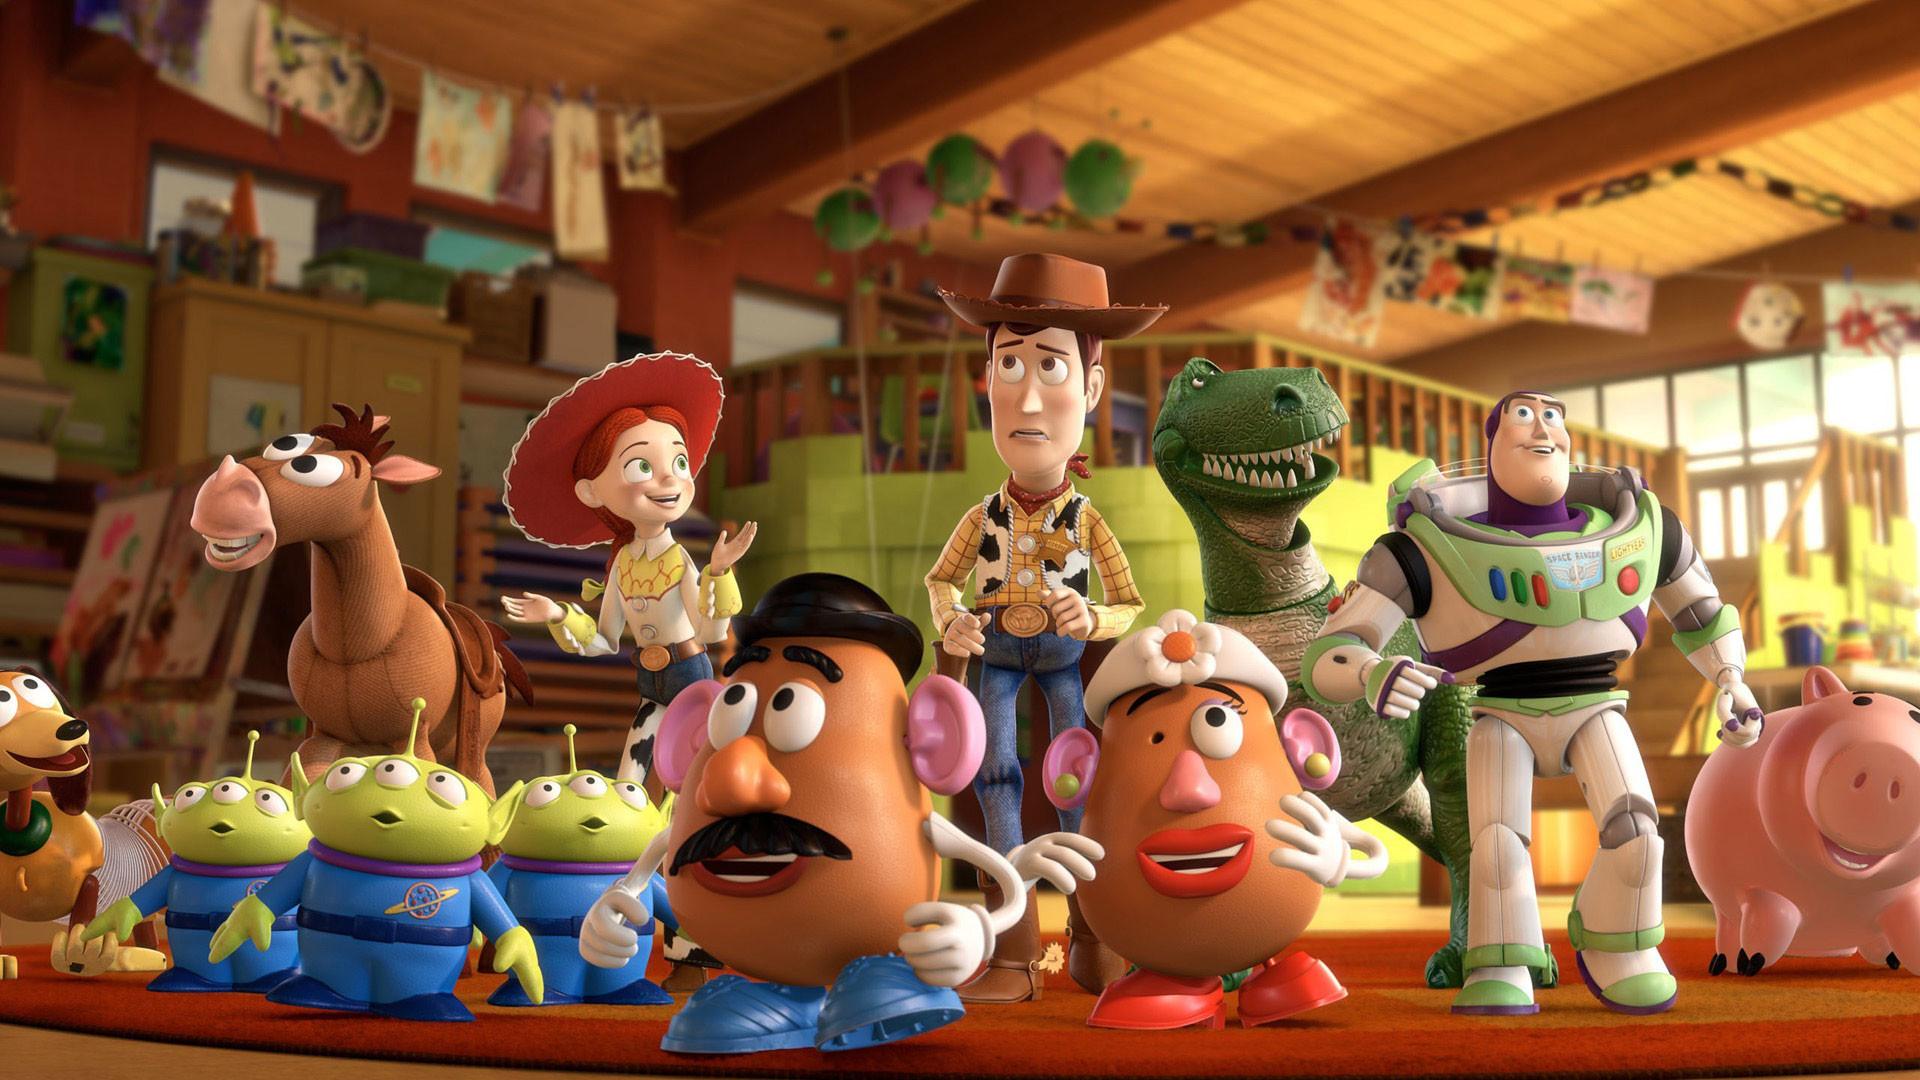 hd pics photos cartoon movie characters nice desktop background wallpaper